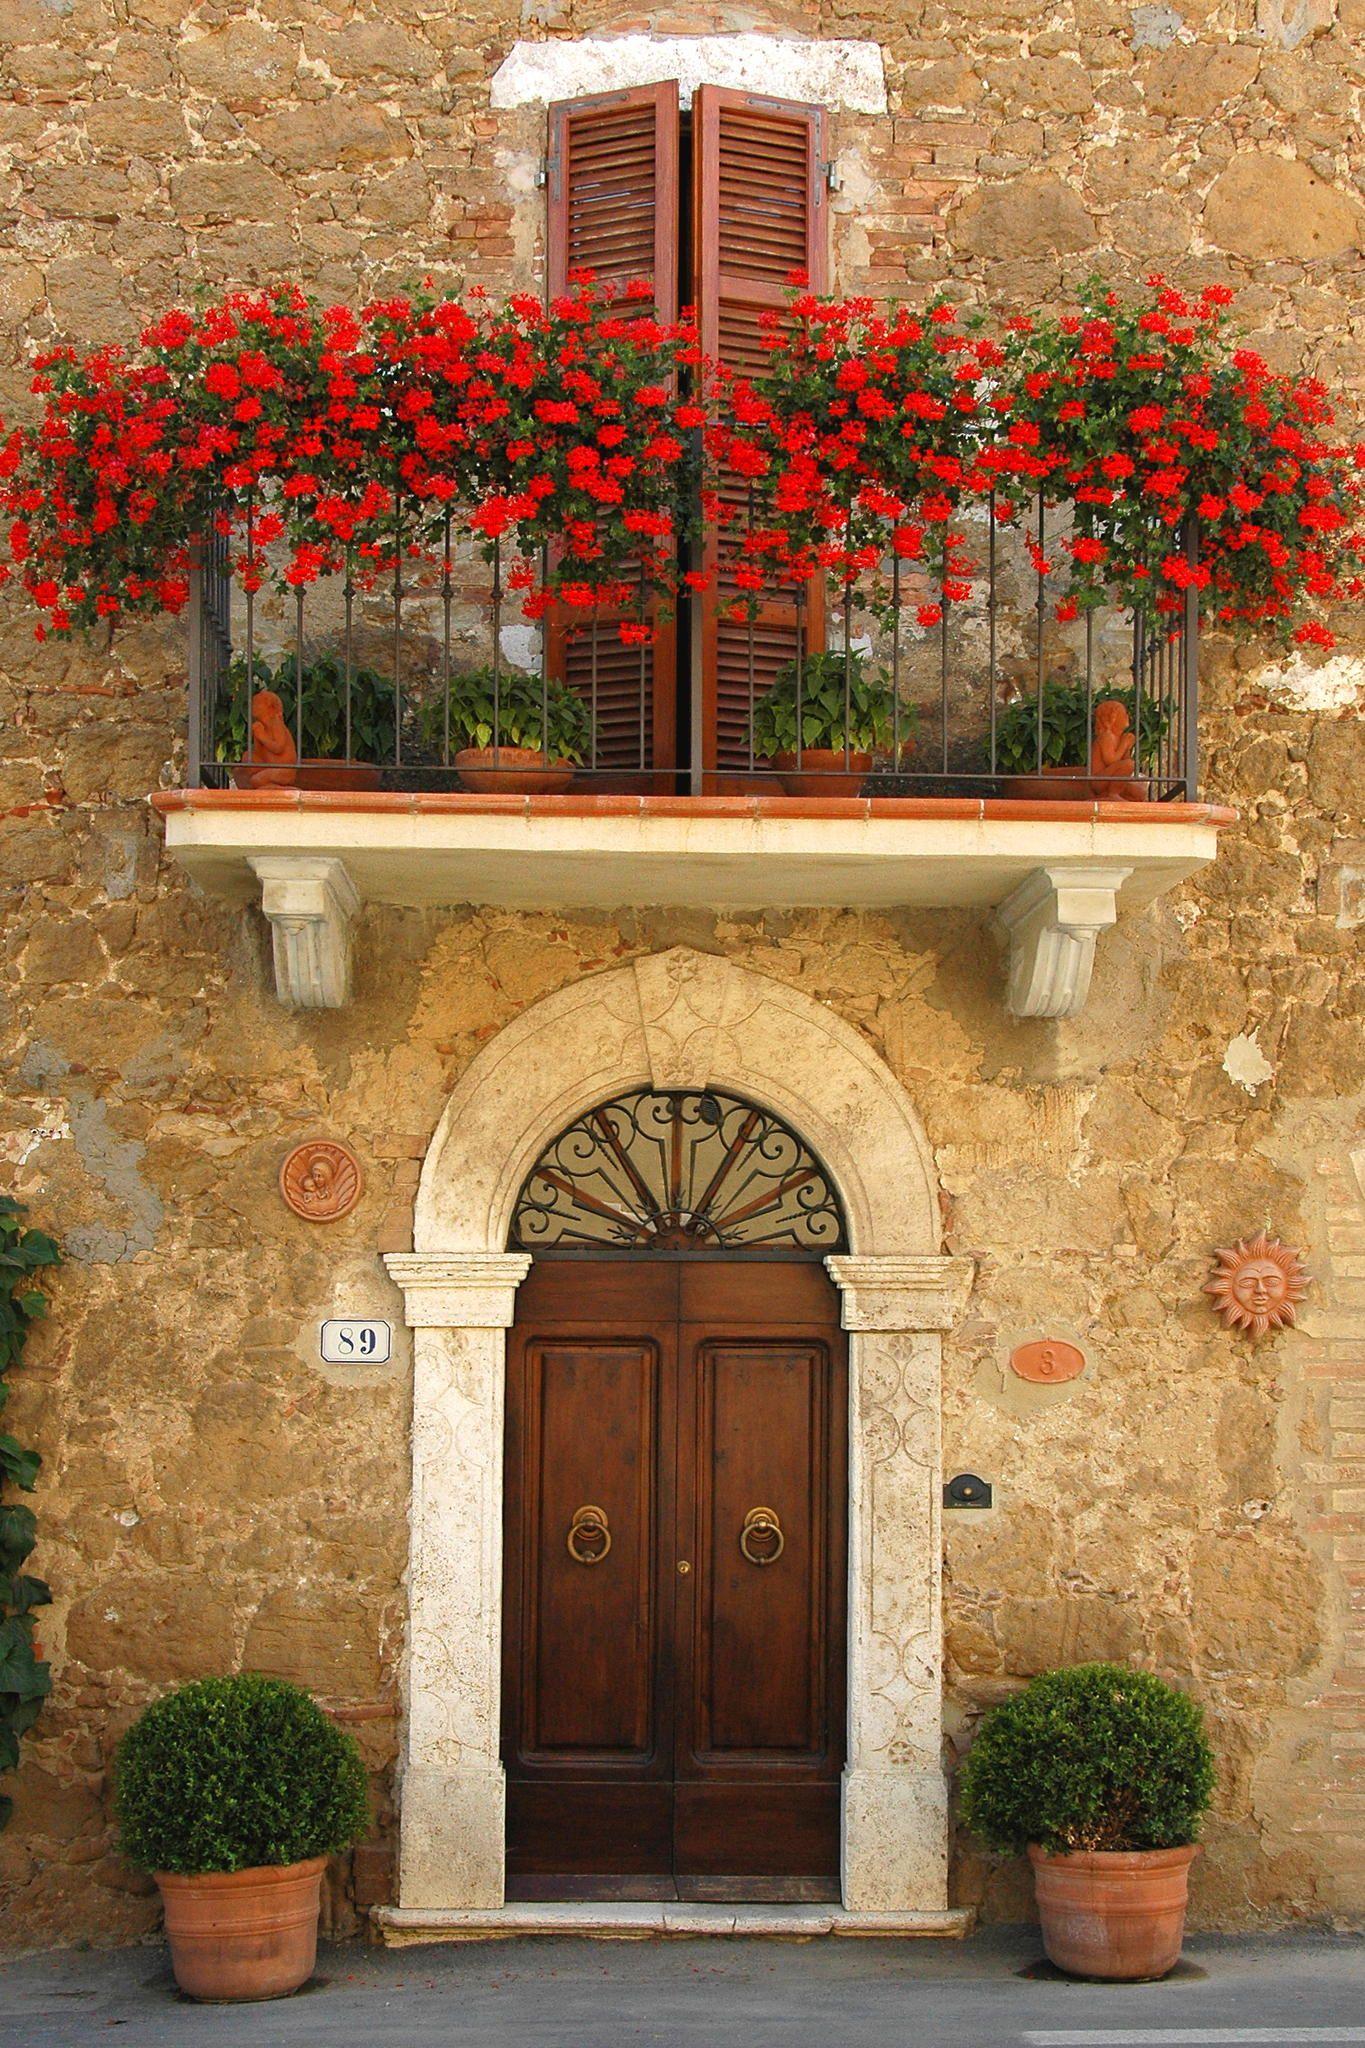 Flores rojas en el balcón toscana italia casas pinterest